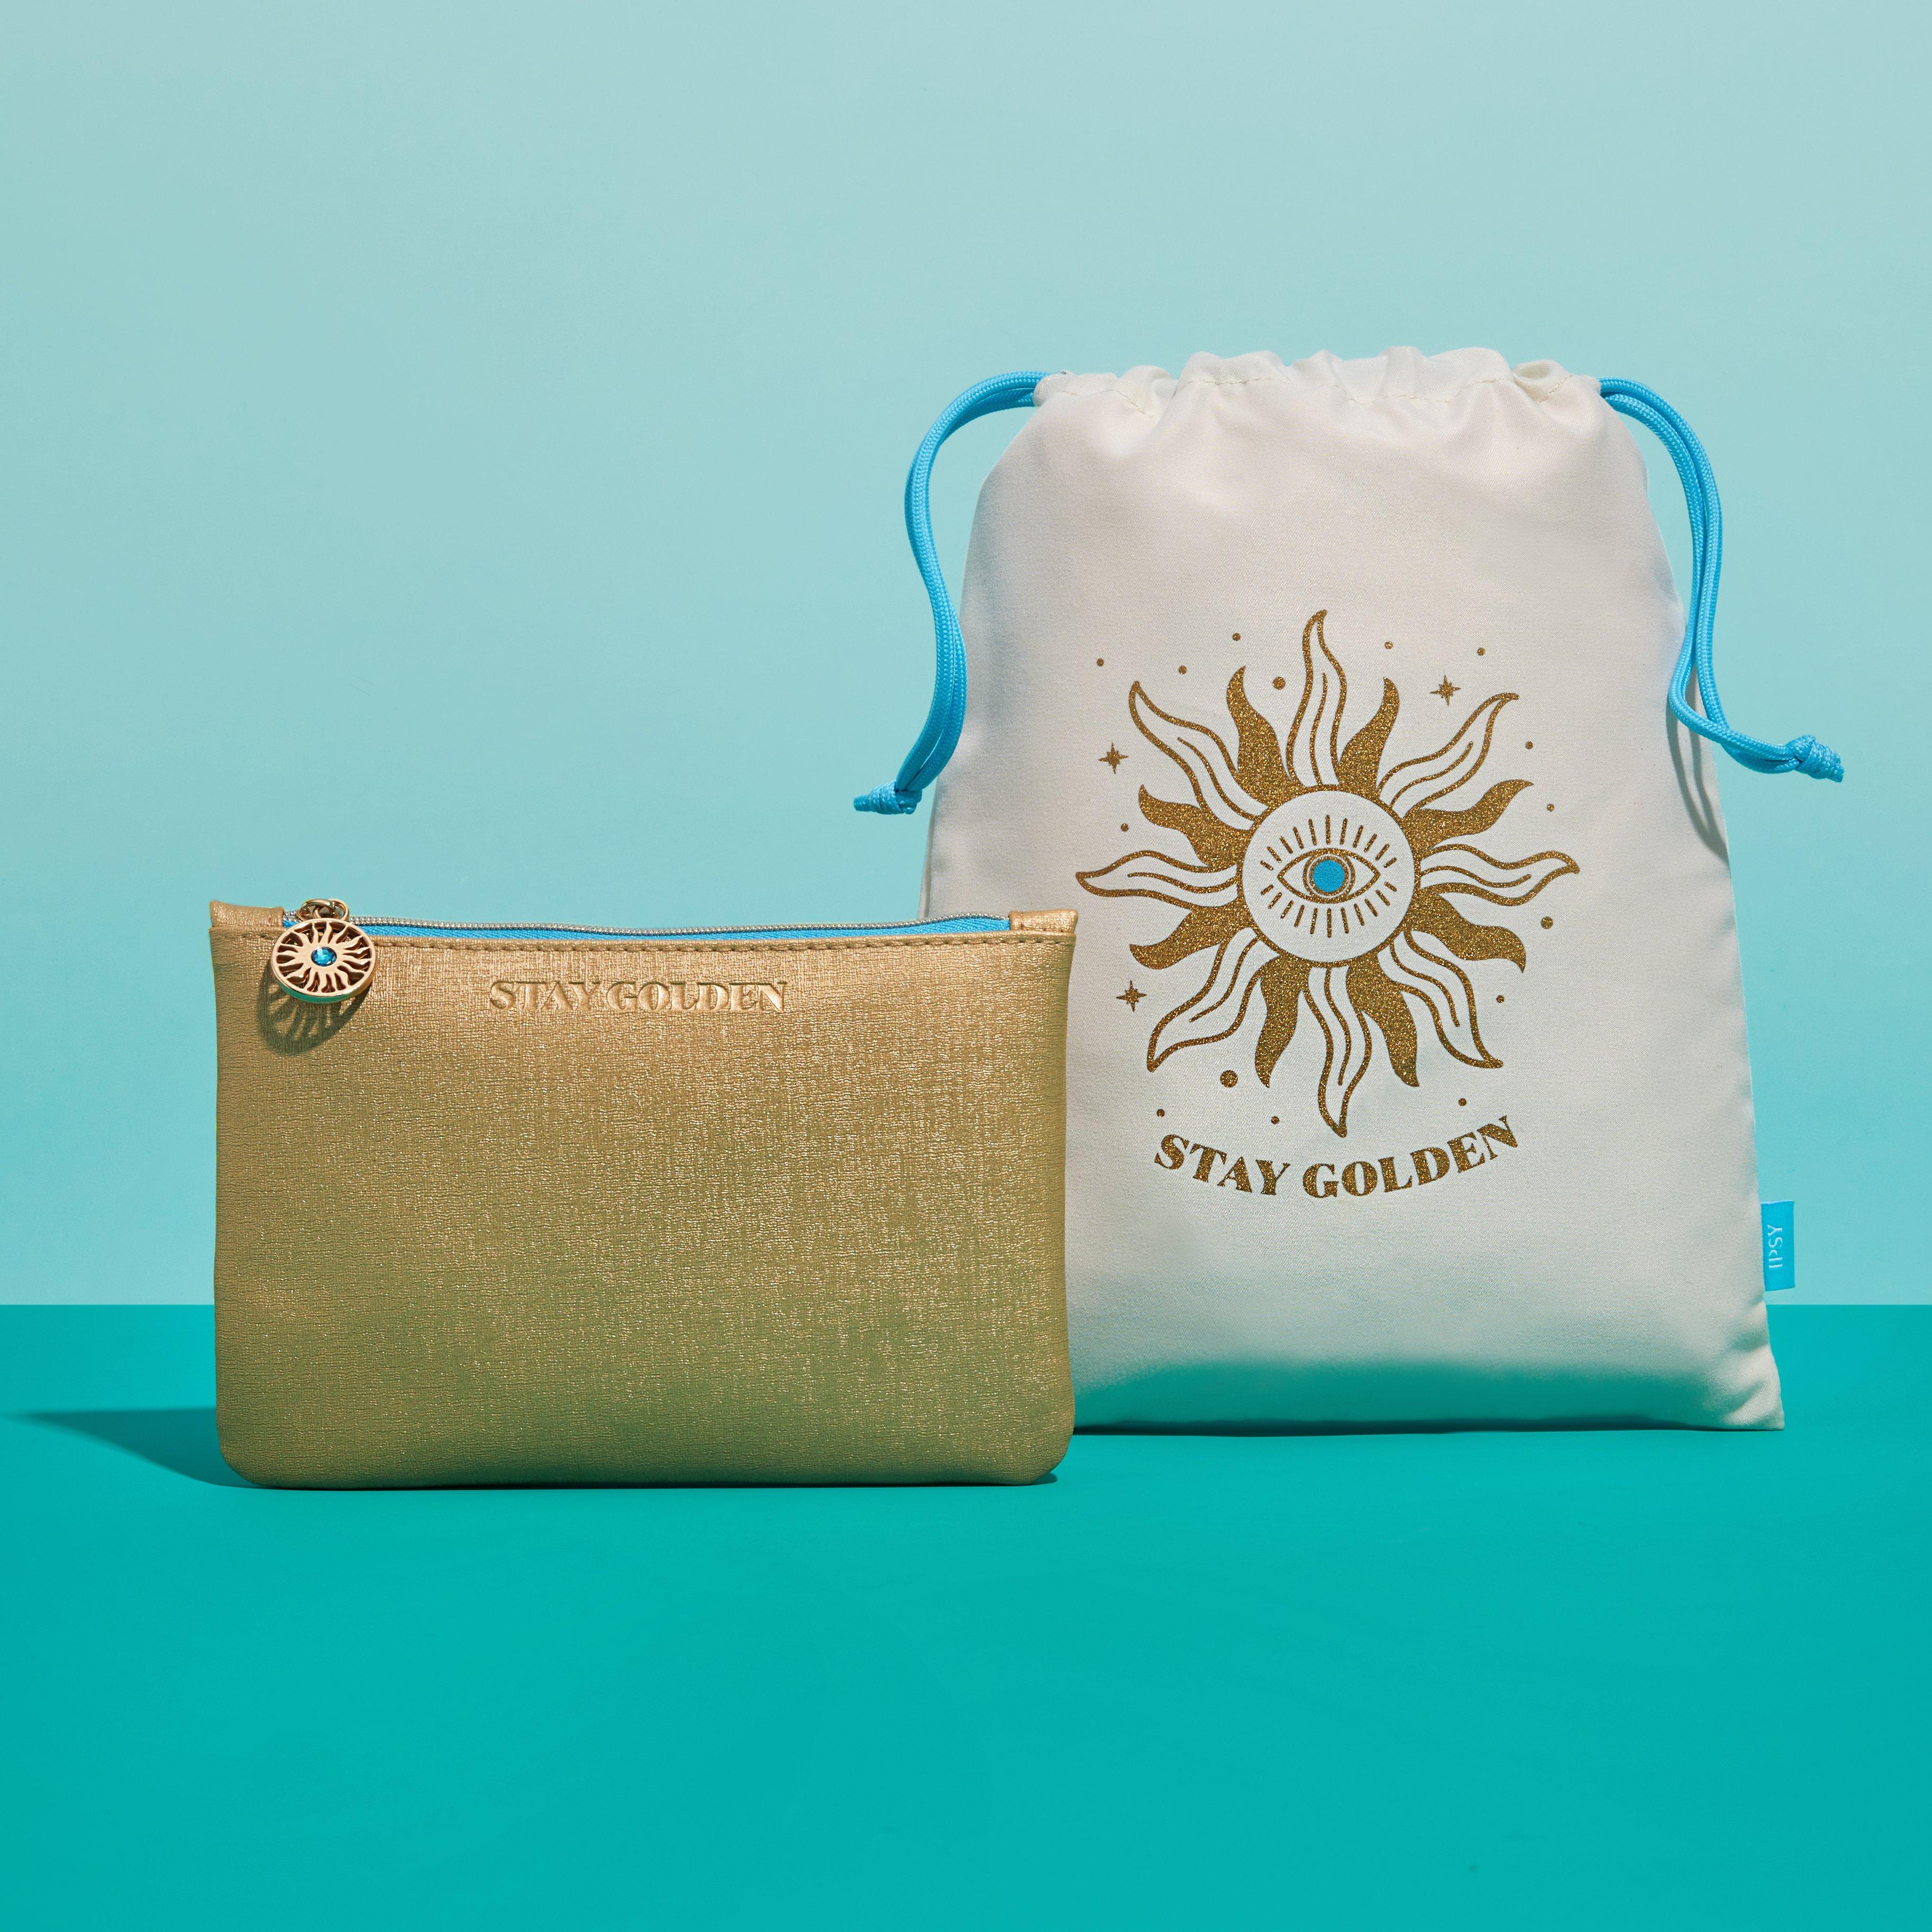 Ipsy Glam Bag + Glam Bag Plus July 2021: See the Bag Designs